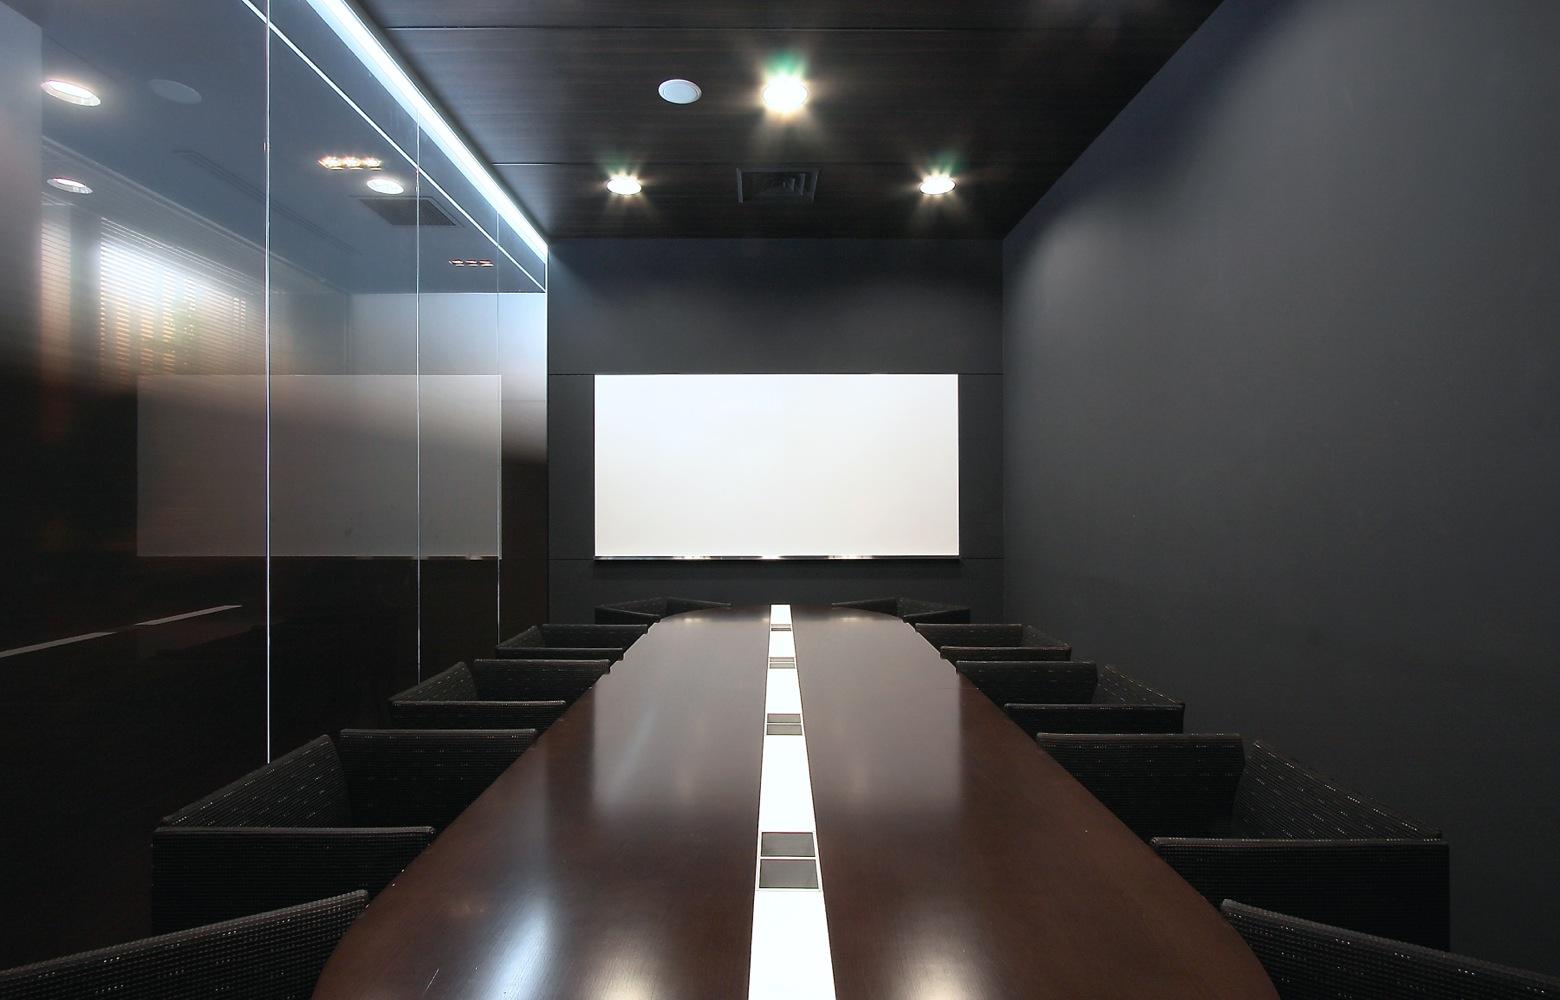 EMTG株式会社 Meeting Room デザイン・レイアウト事例